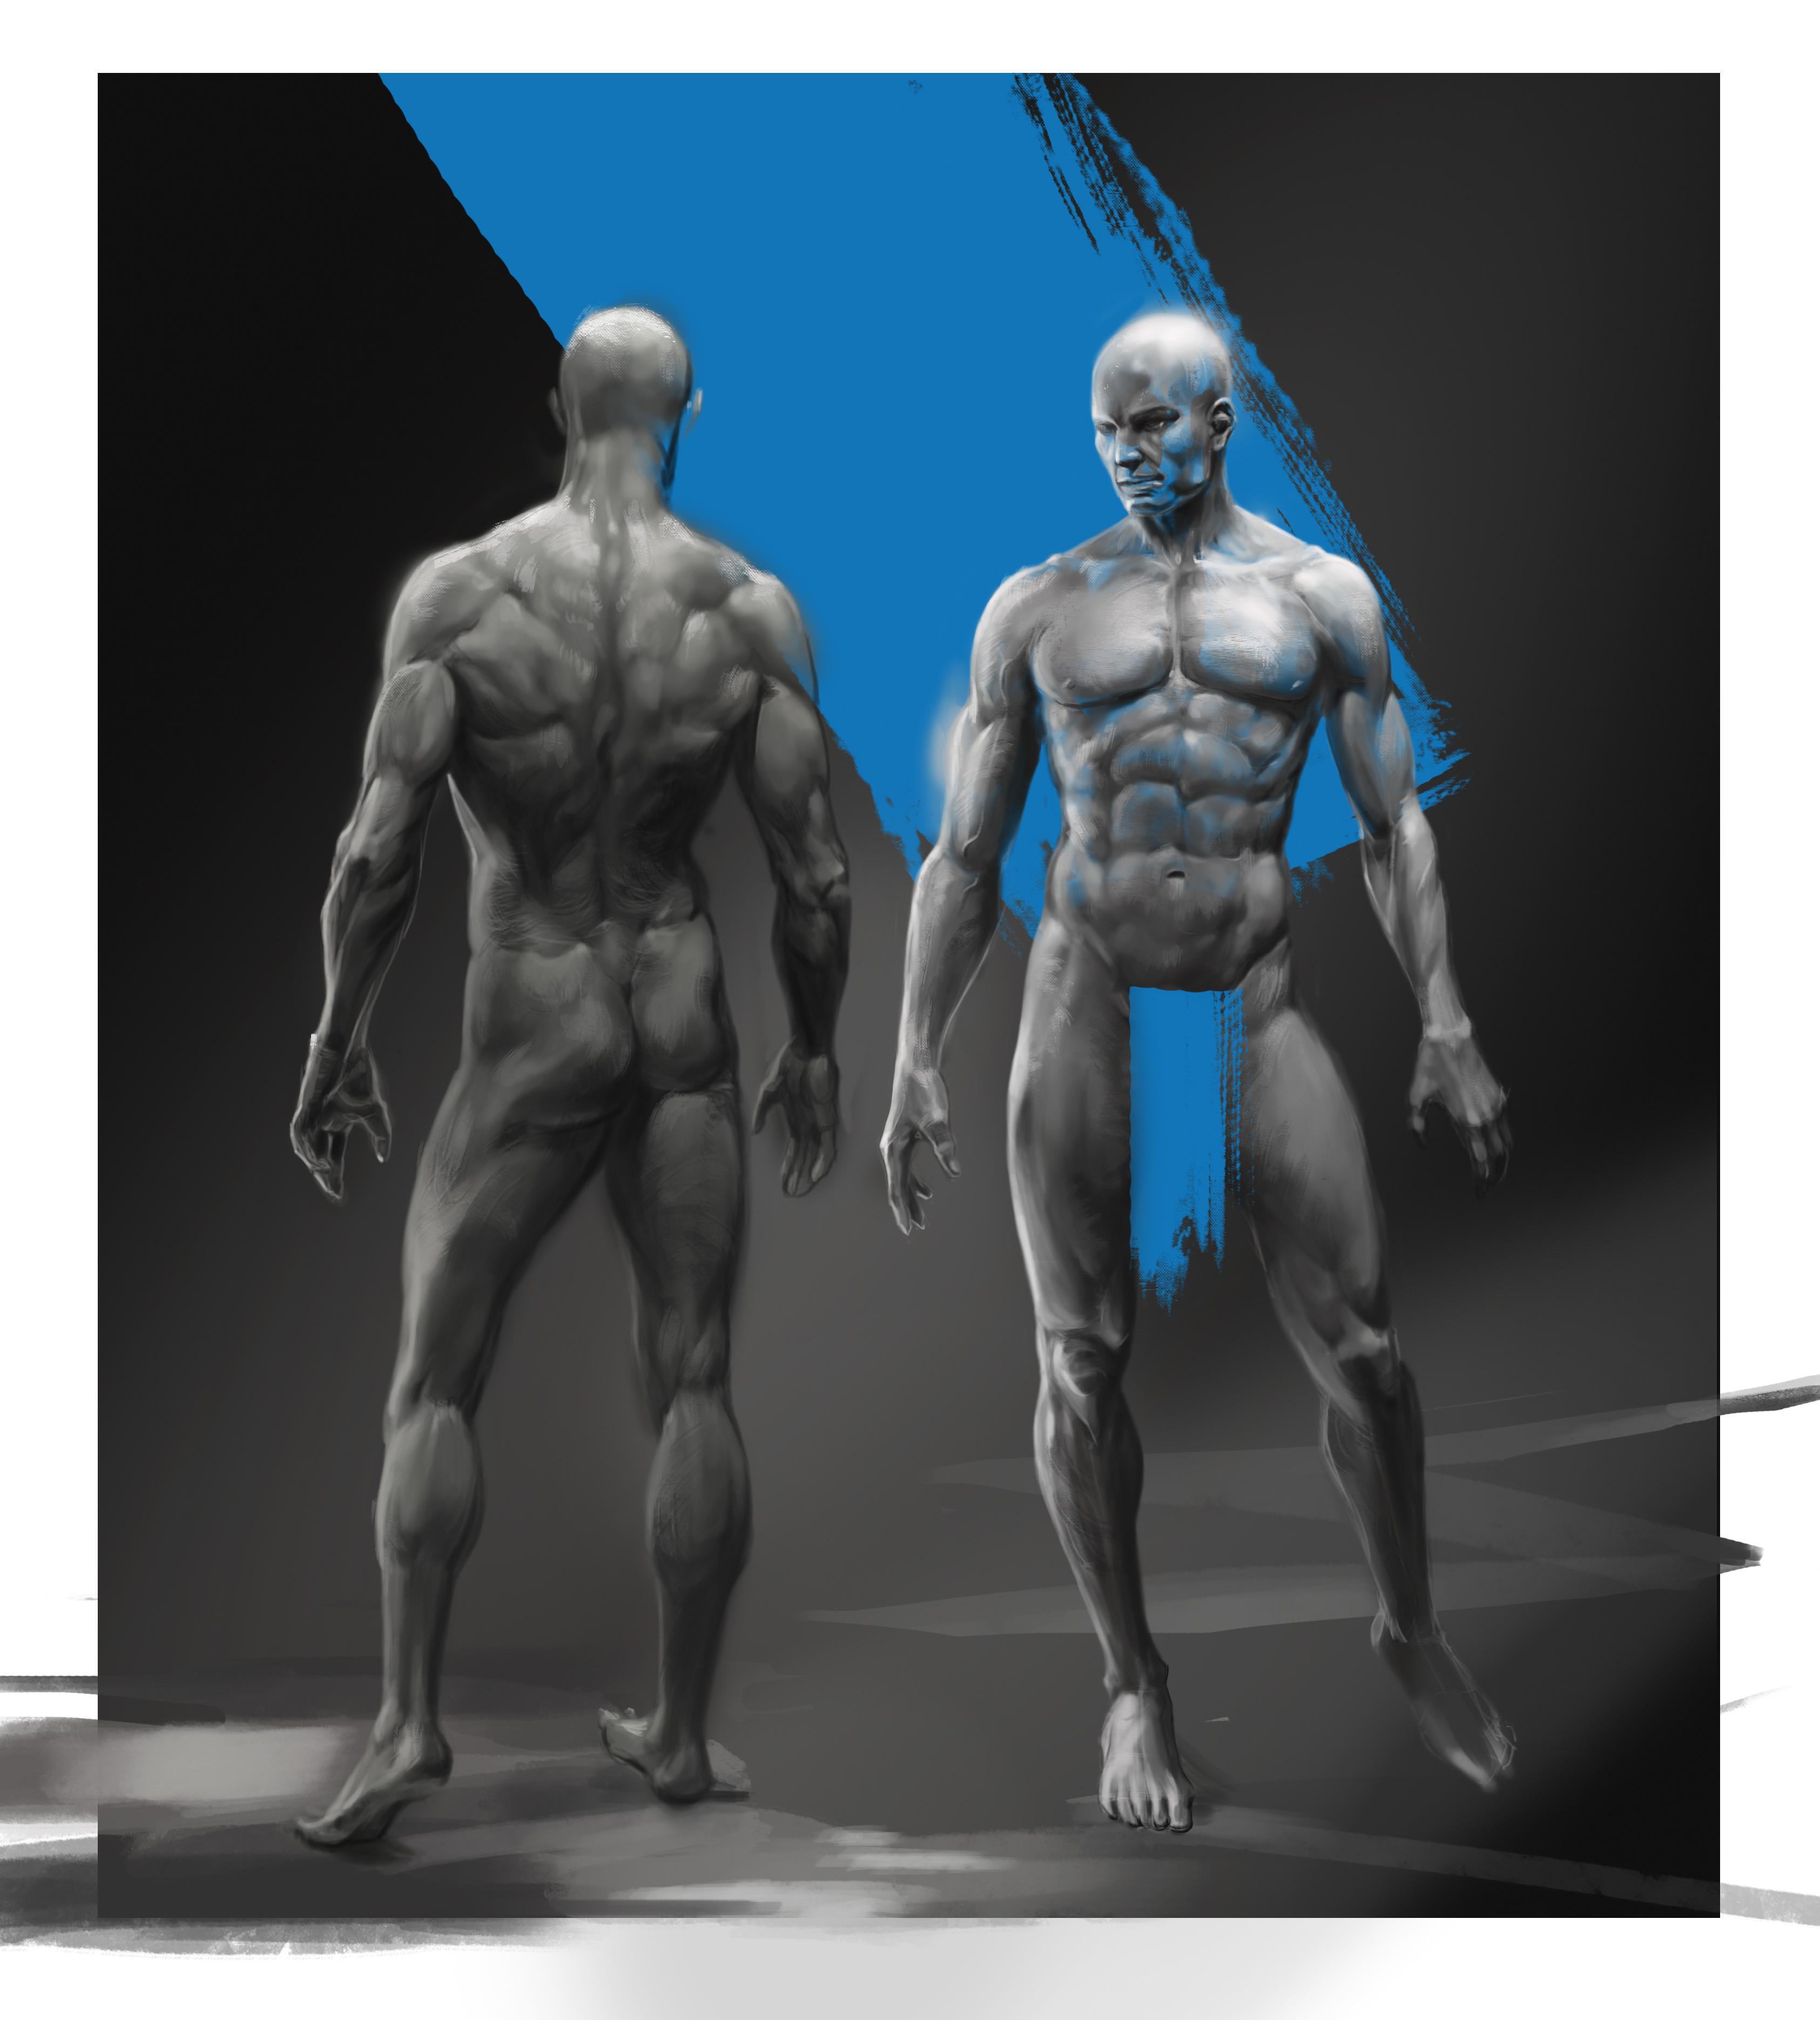 Male anatomy study based on jang seonghwan 3D artwork